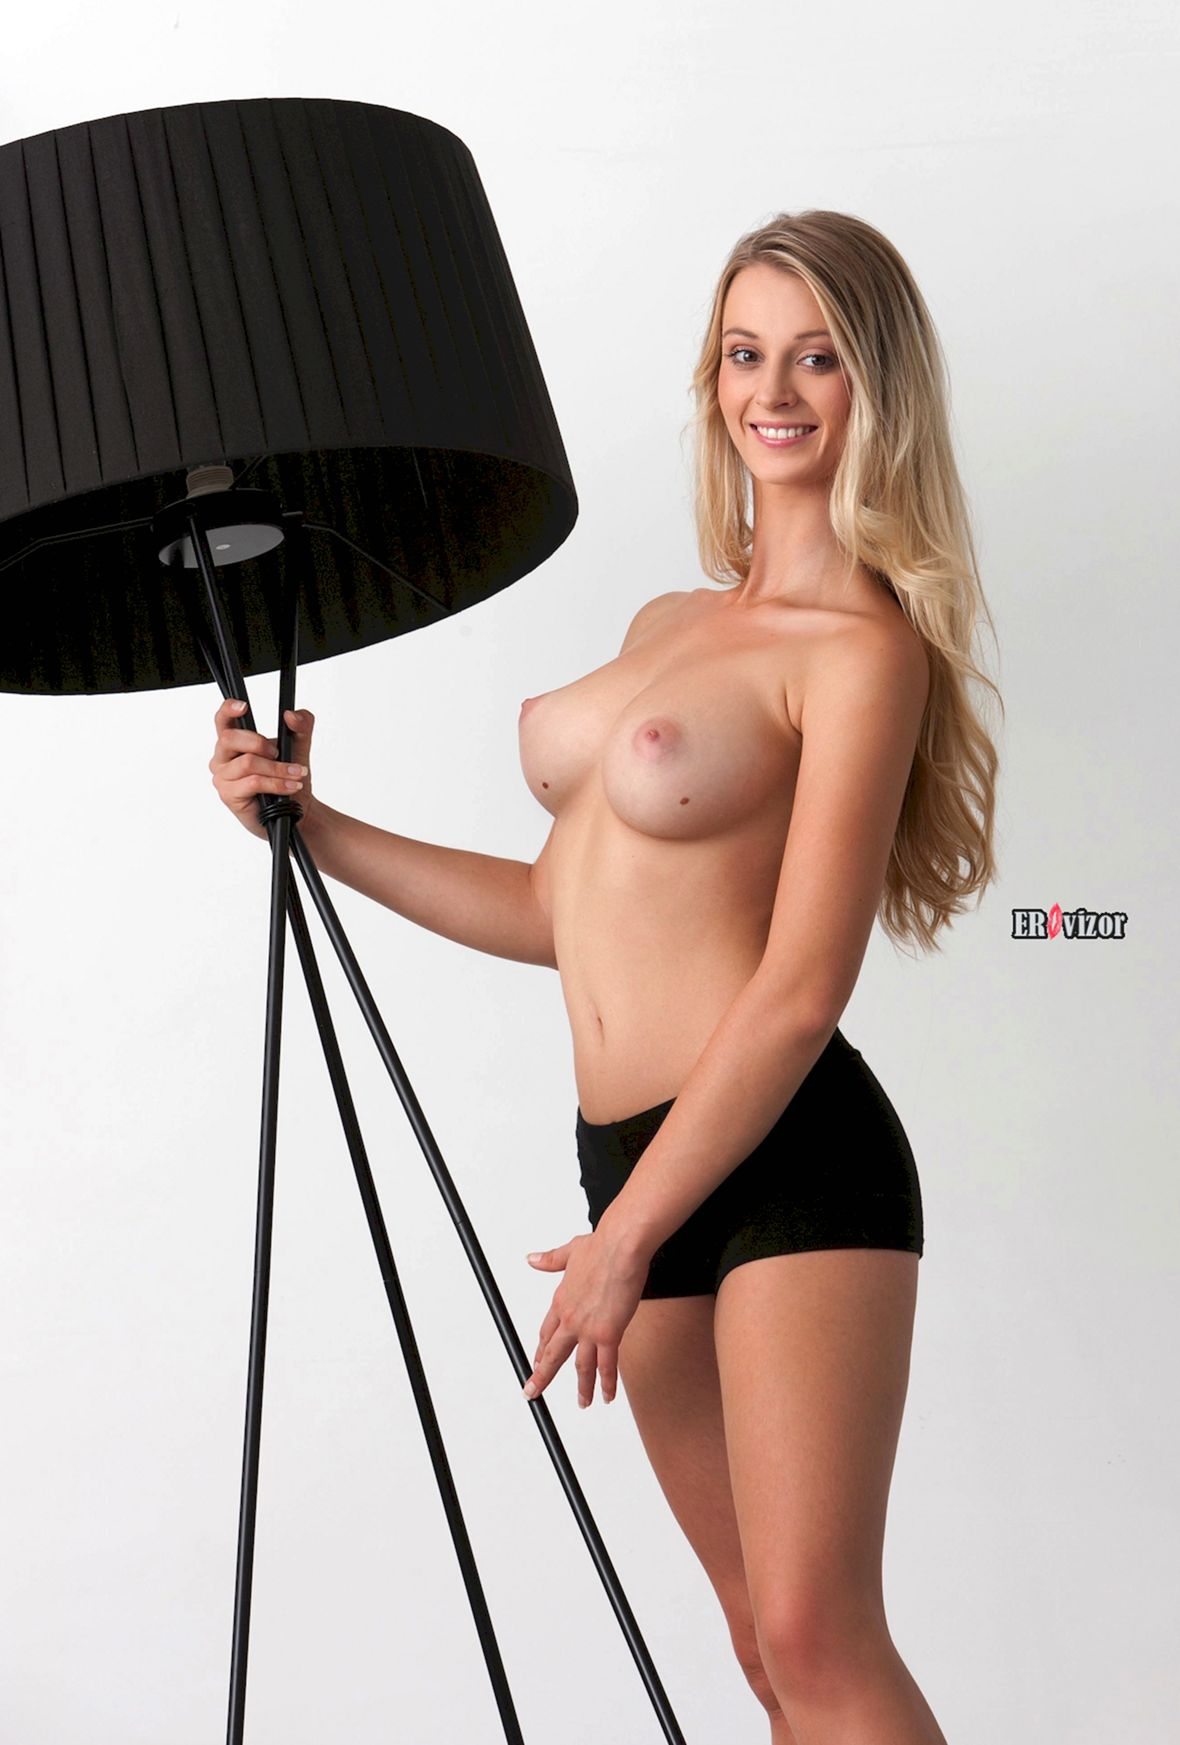 Blonde-Babe-Carisha-with-Big-Tits (6)